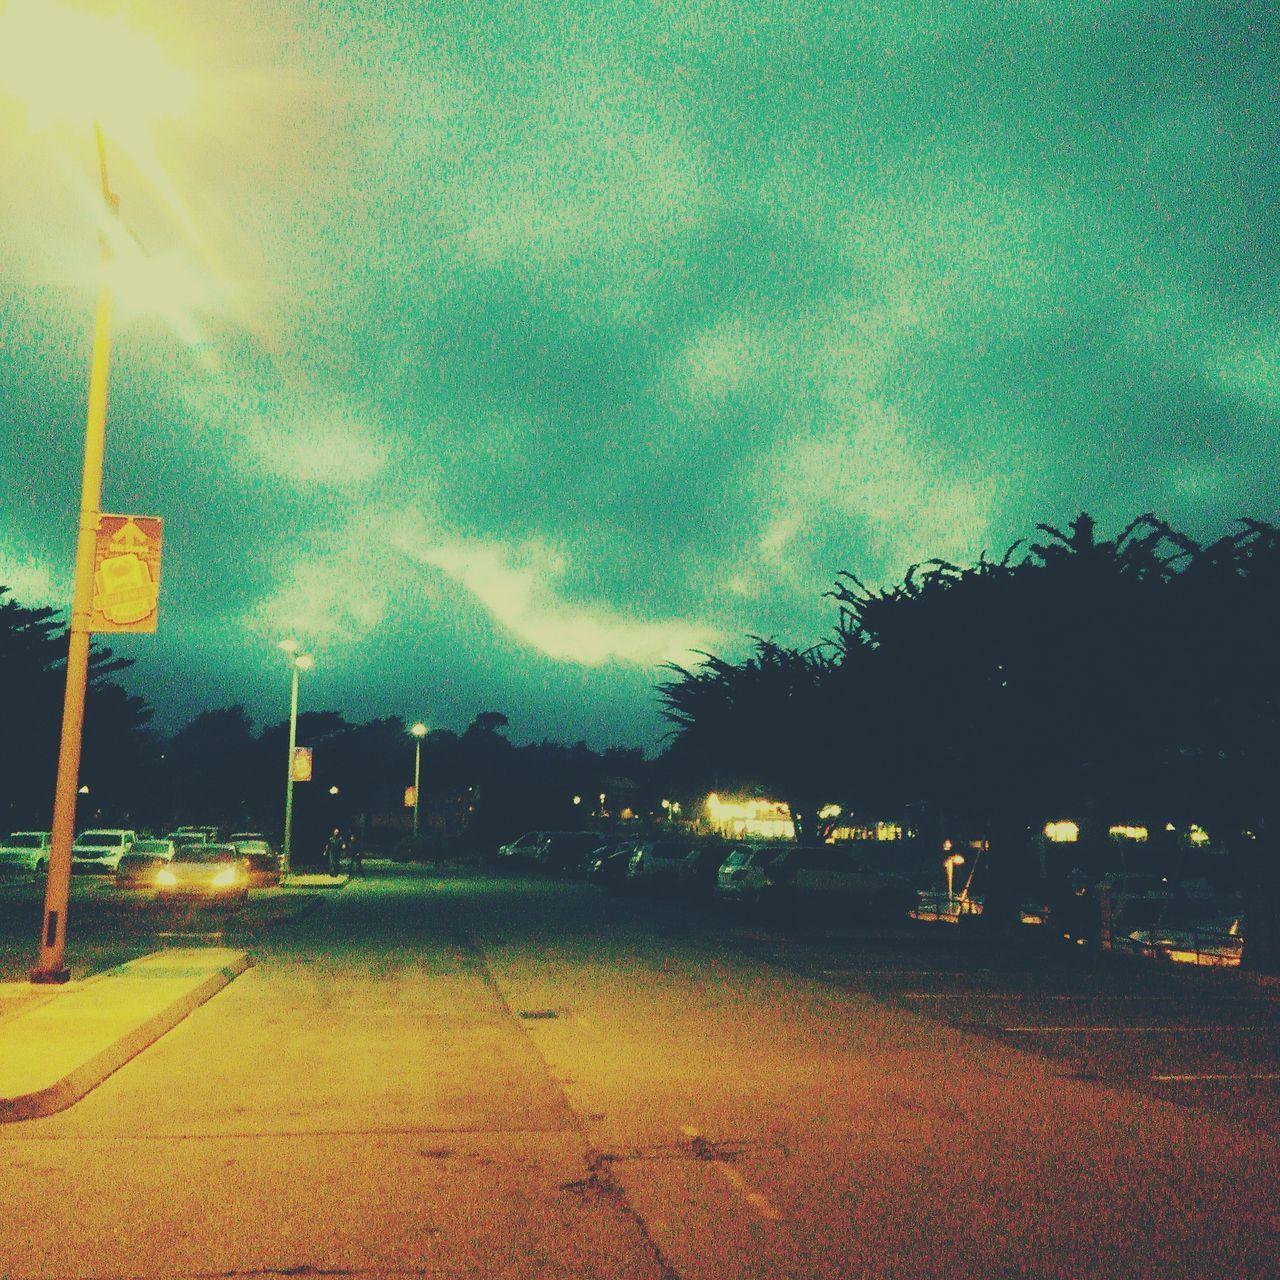 tree, sky, no people, street, road, street light, cloud - sky, illuminated, outdoors, night, nature, architecture, city